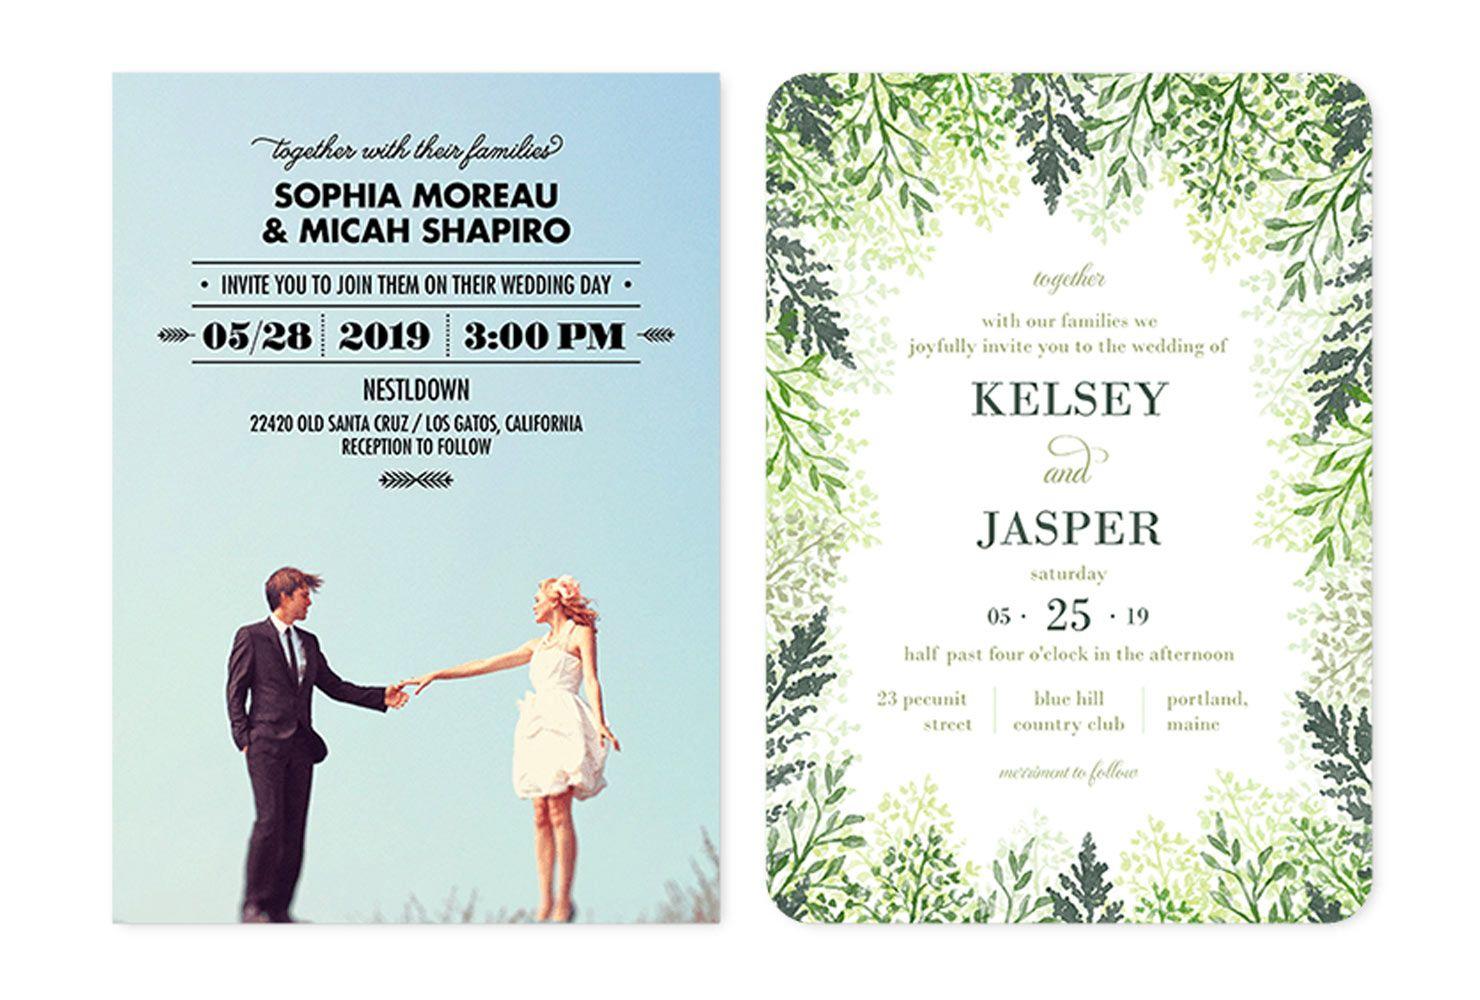 35+ Wedding Invitation Wording Examples 2020 in 2020